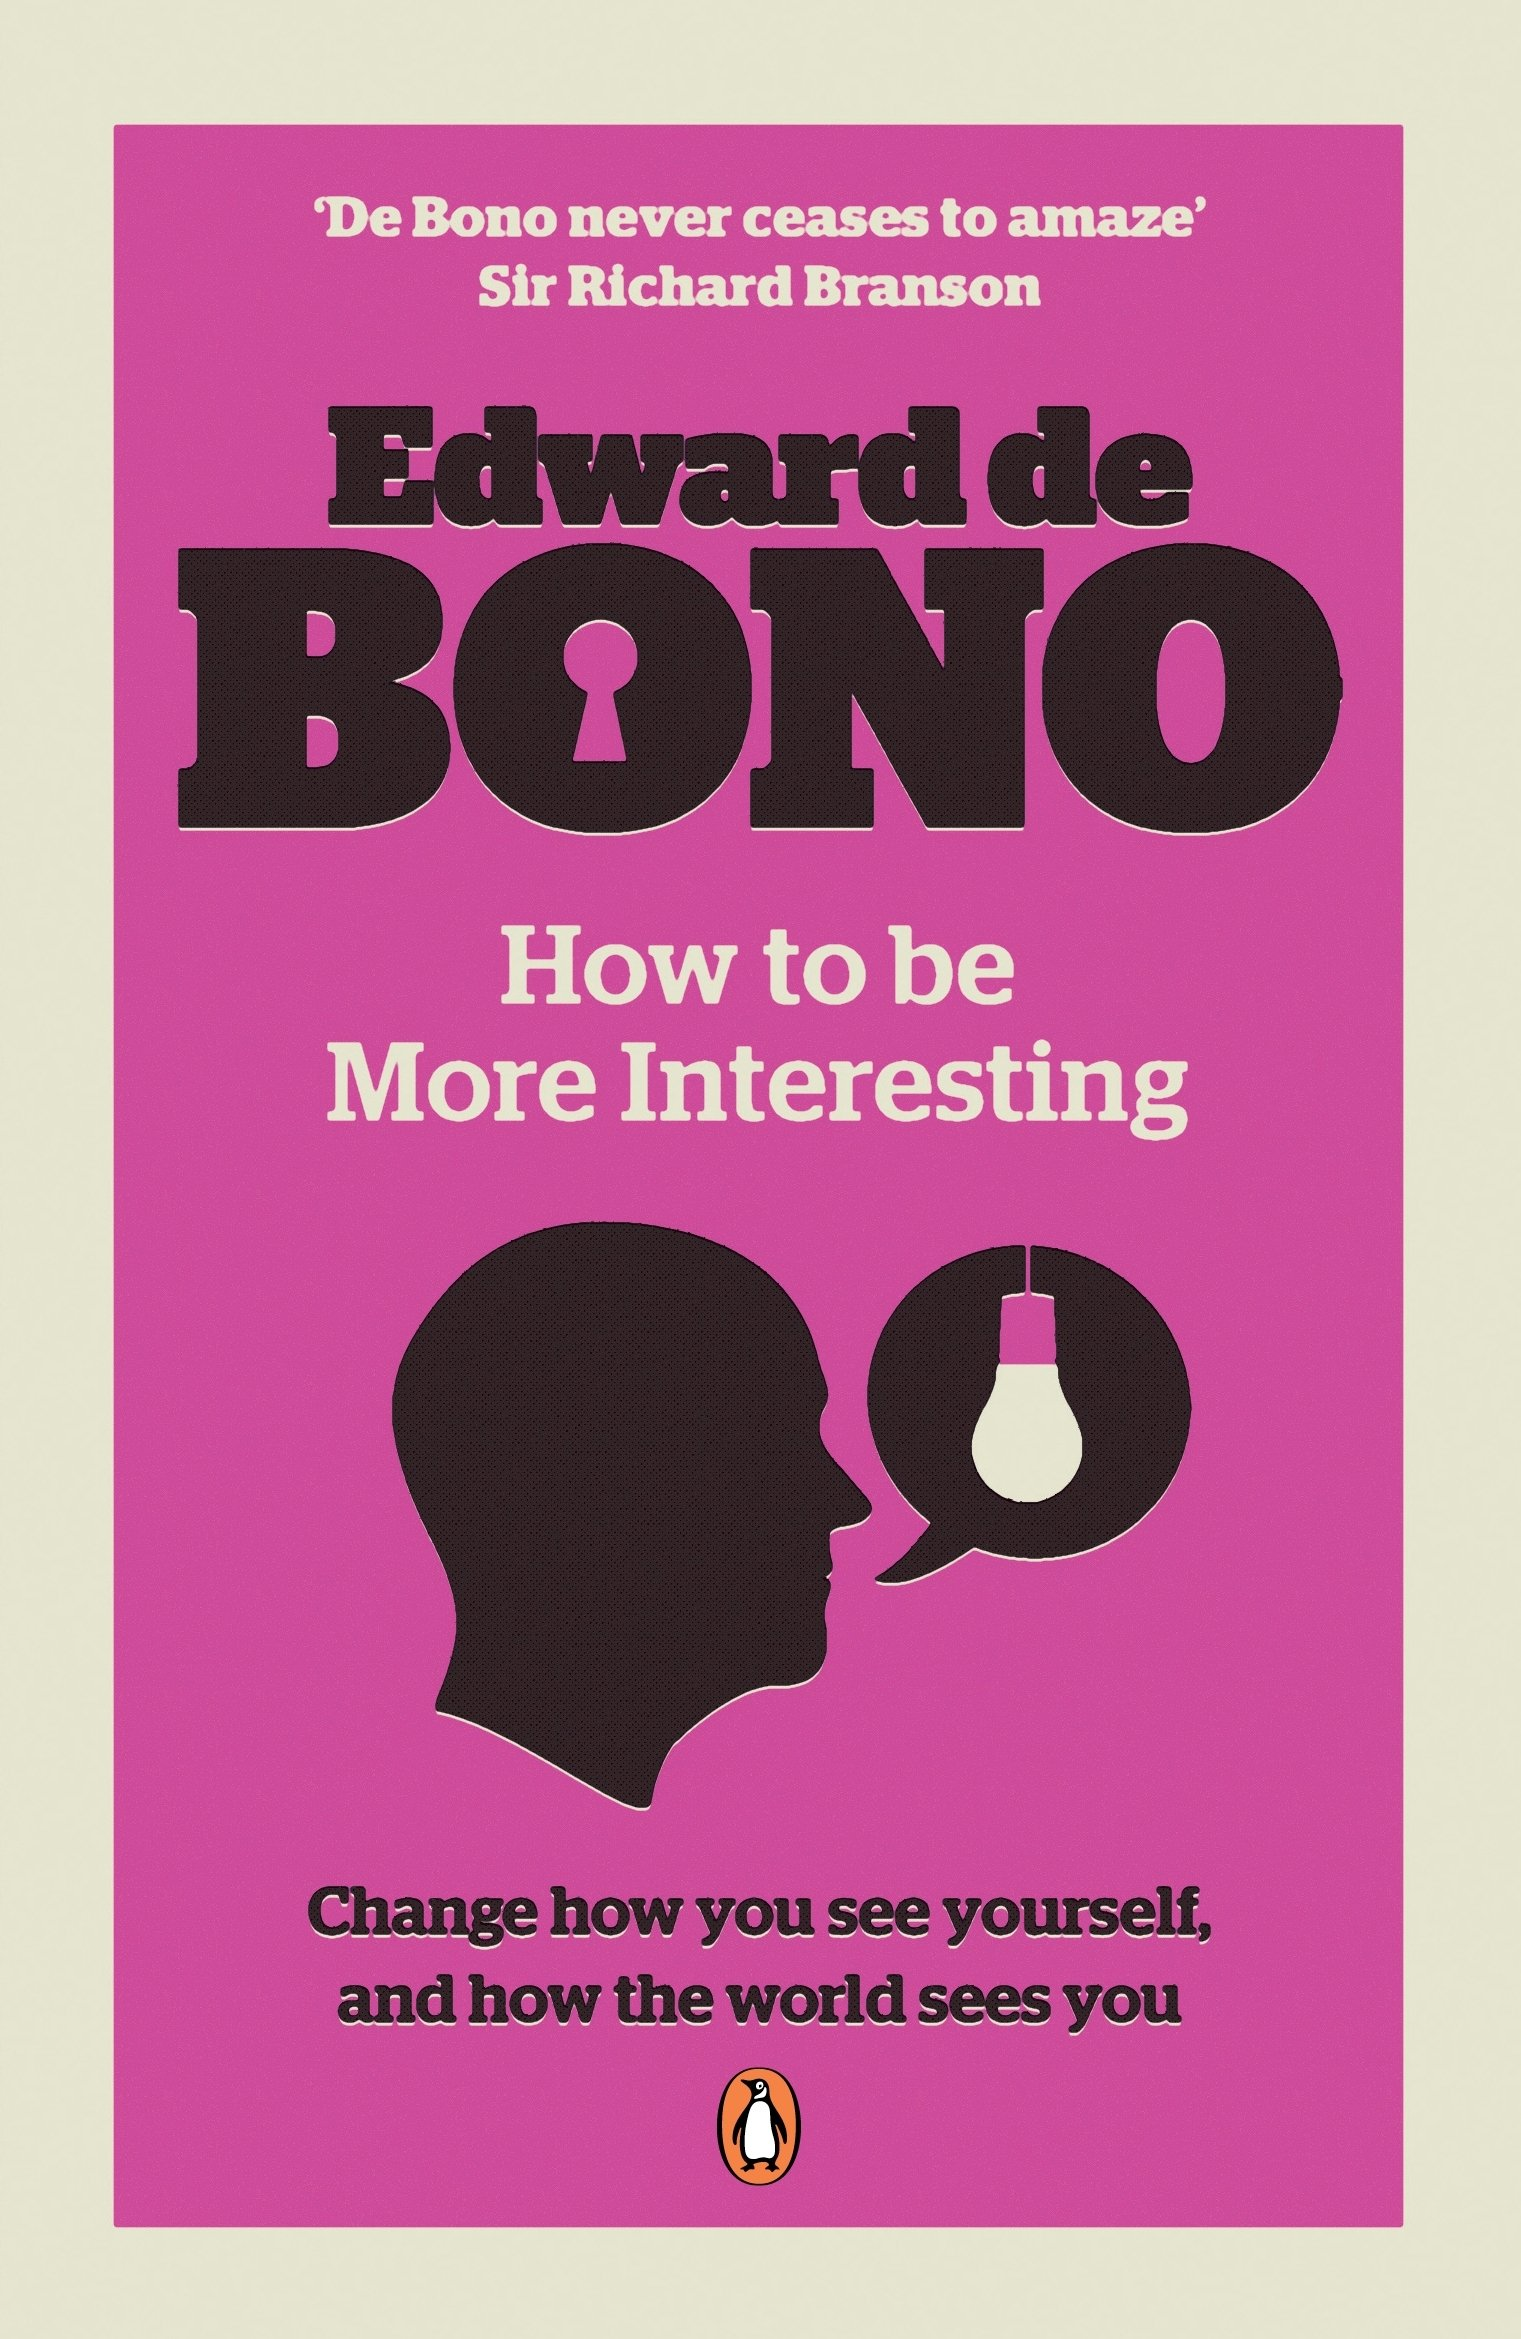 teach yourself to think edward de bono pdf free download